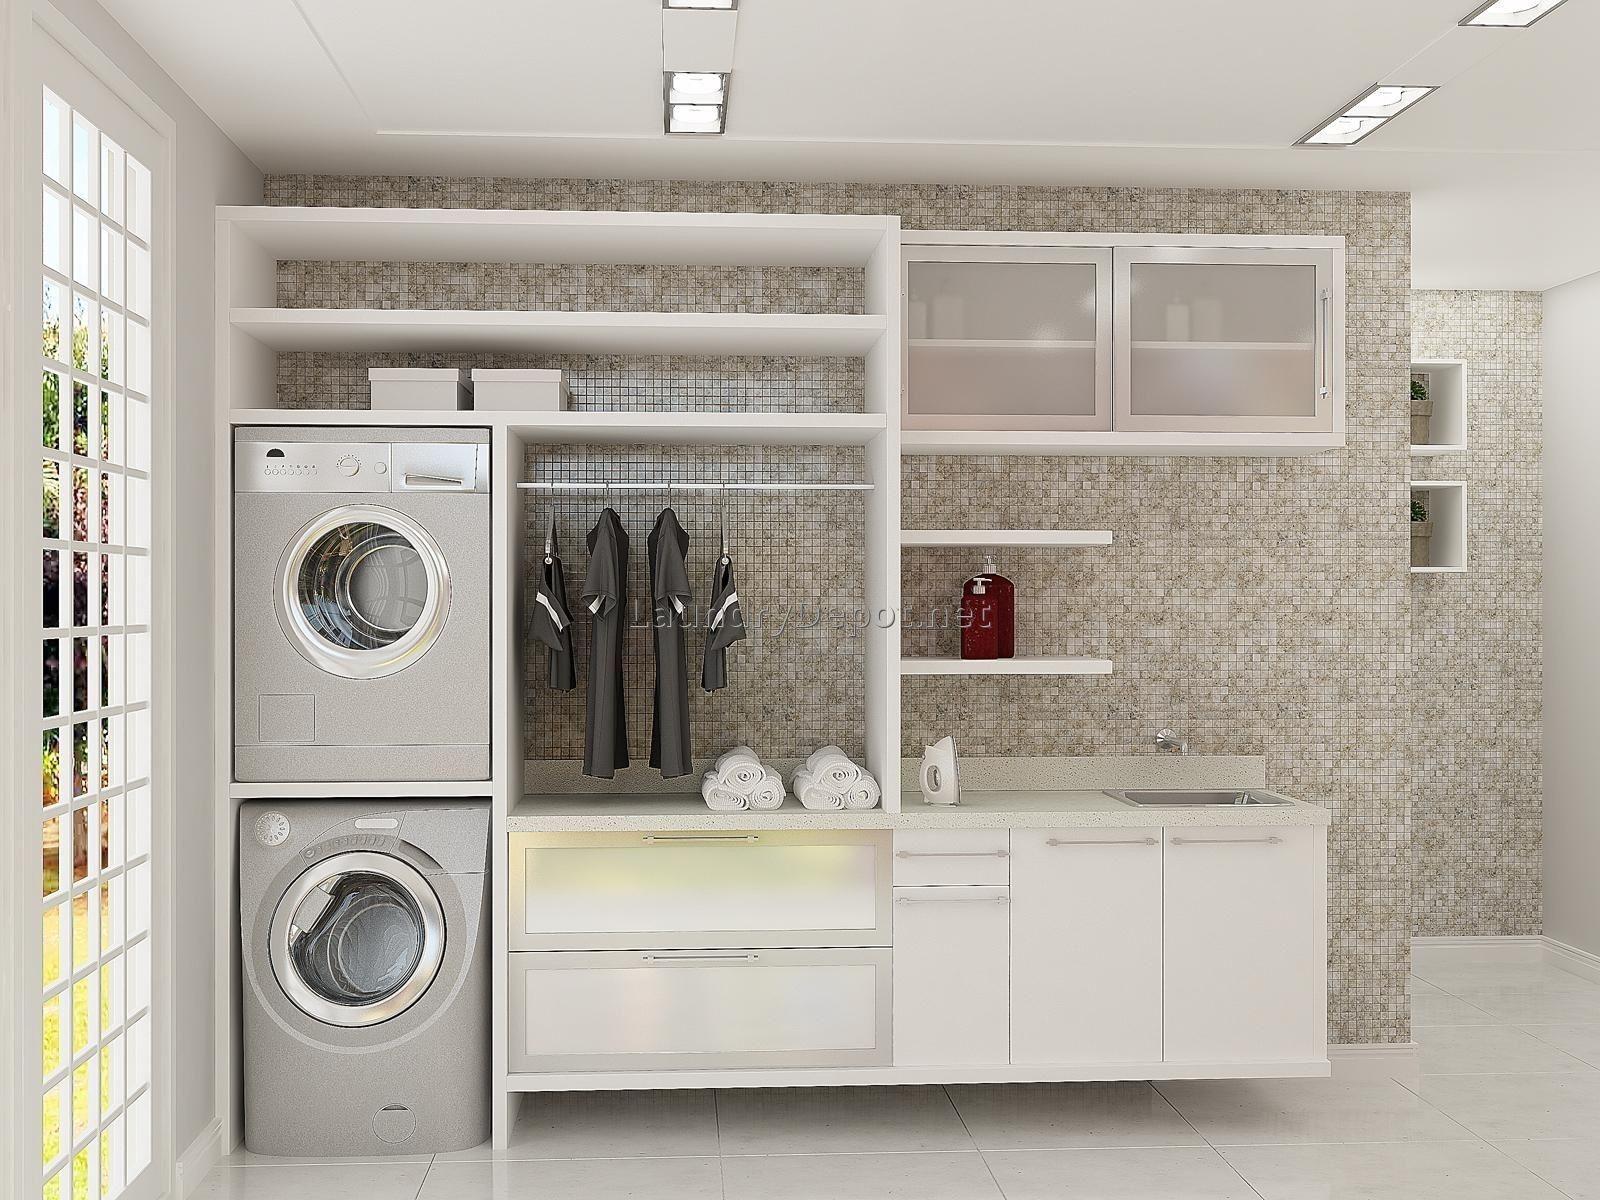 cabinets custom gllry by closets laundry lago california shaker venetian room storage chicago ideas wenge rooms